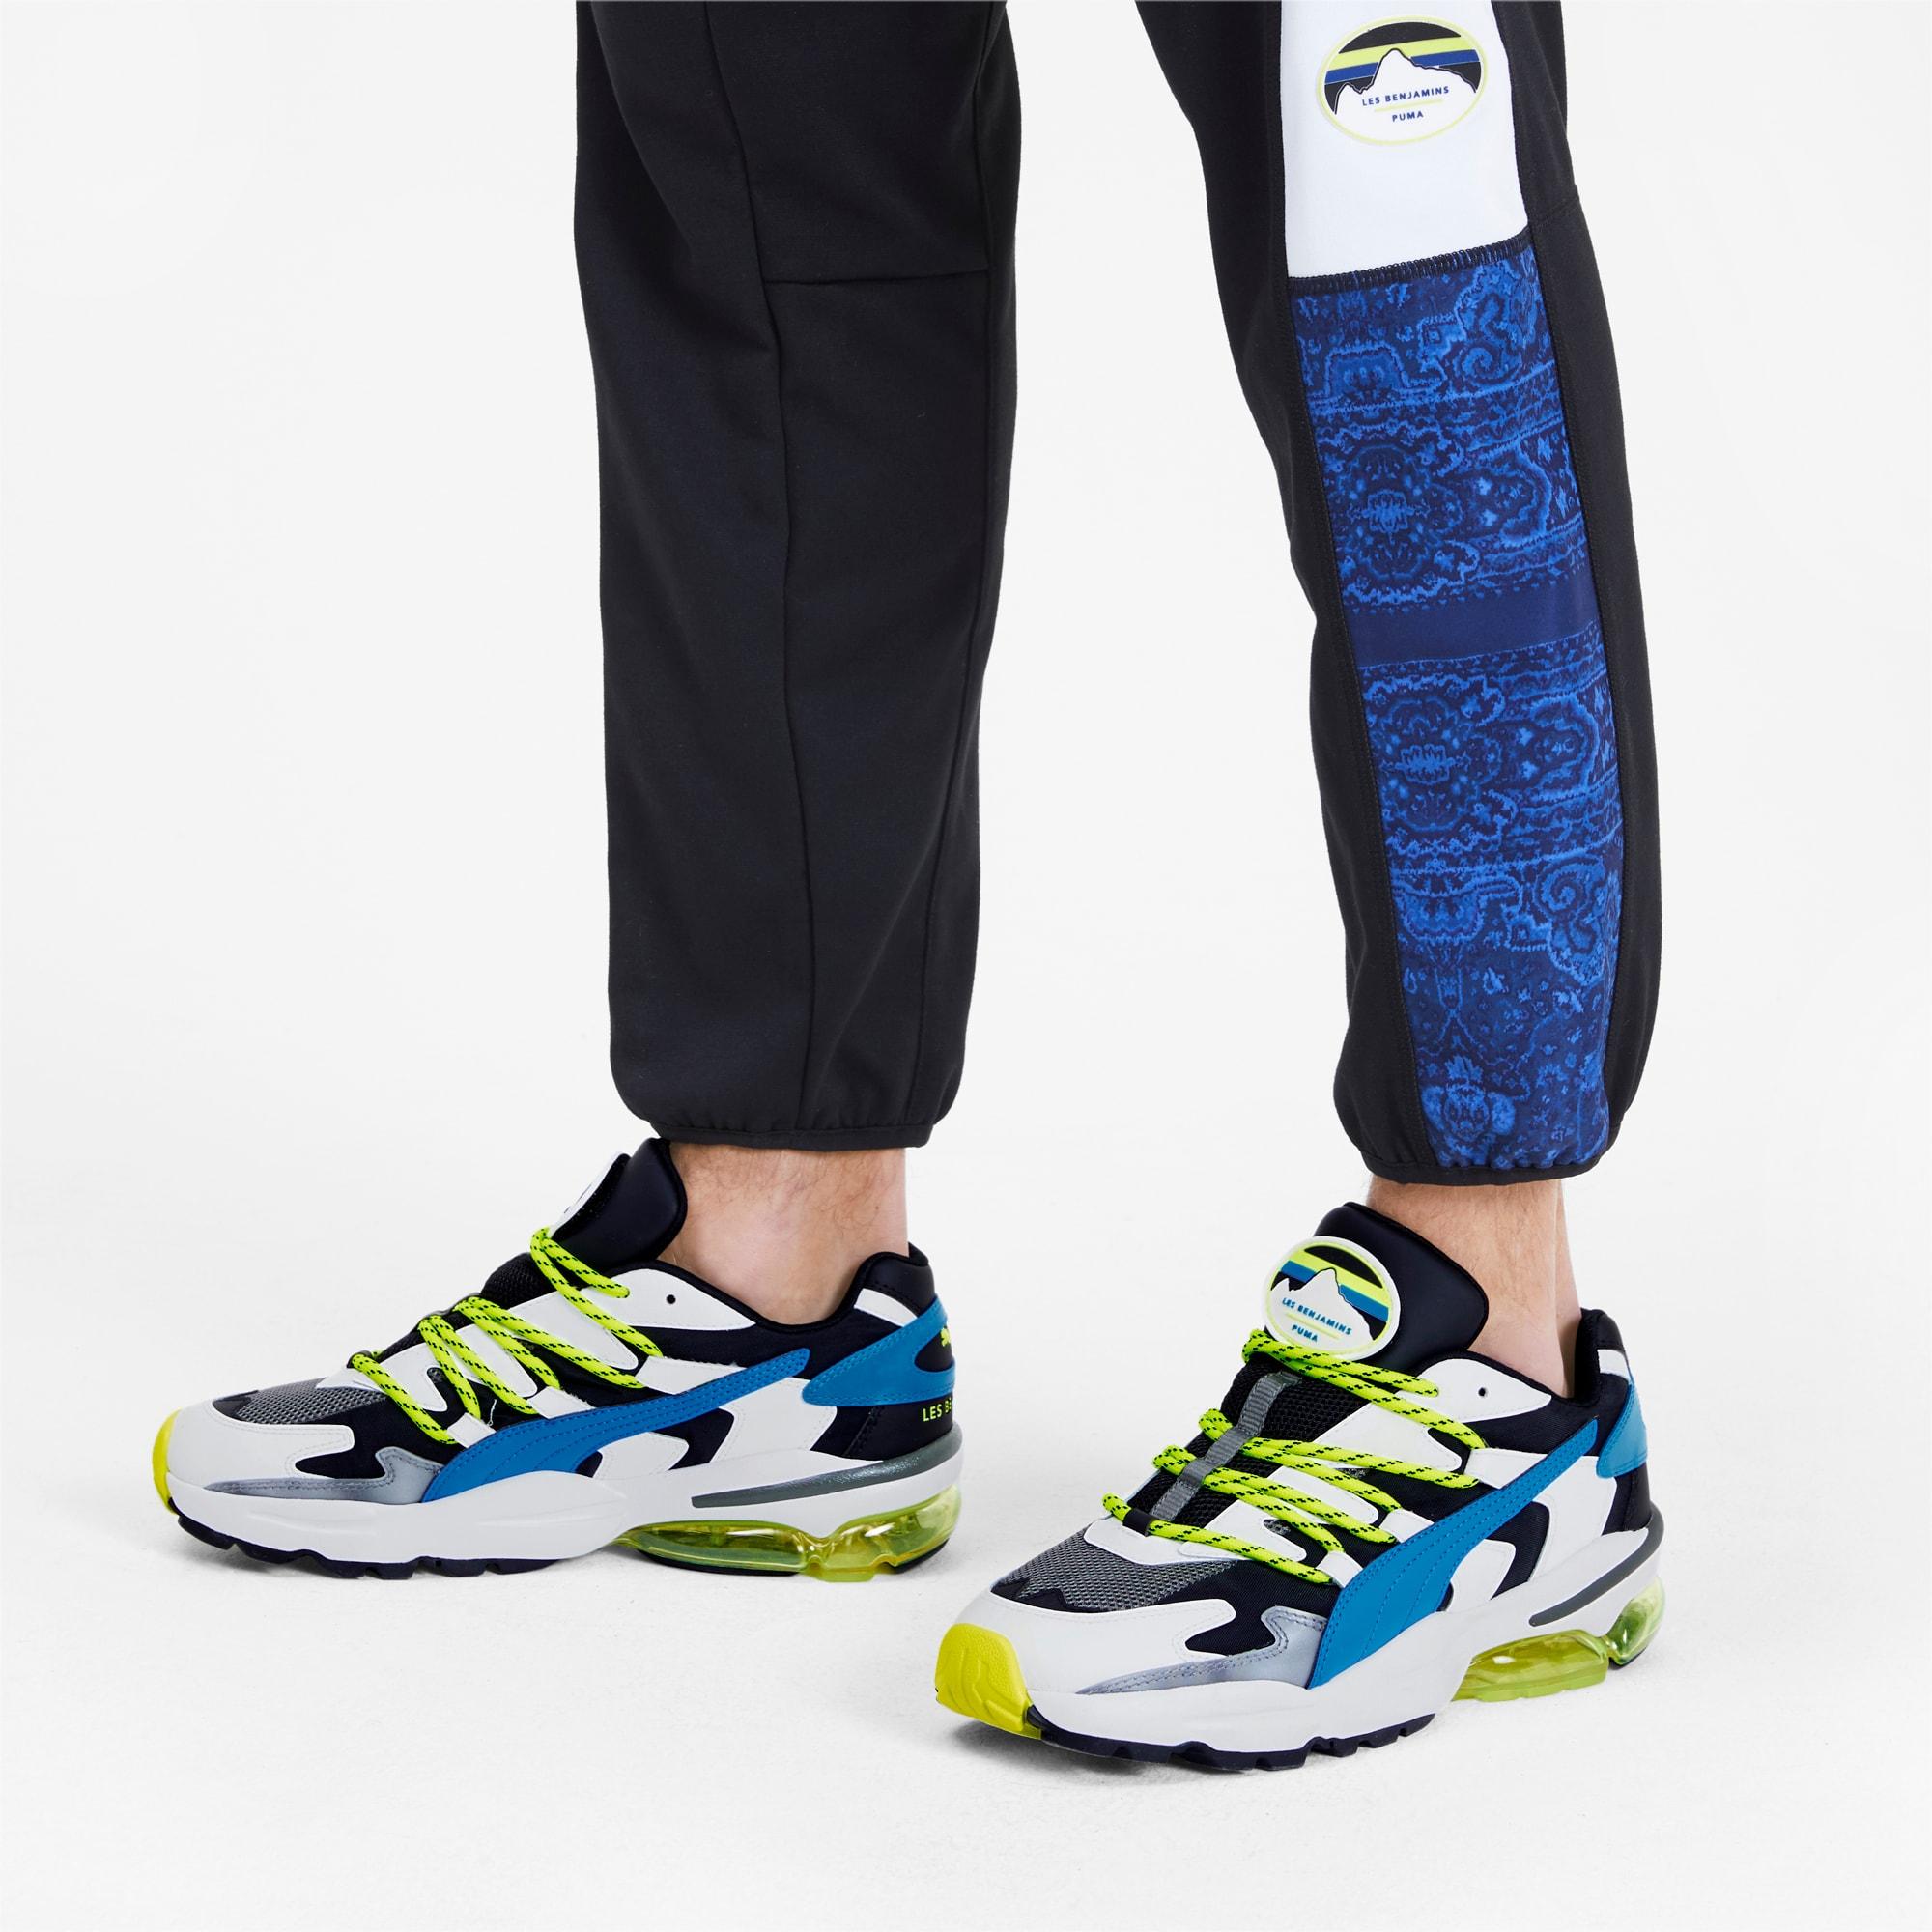 PUMA x LES BENJAMINS CELL Alien Sneaker